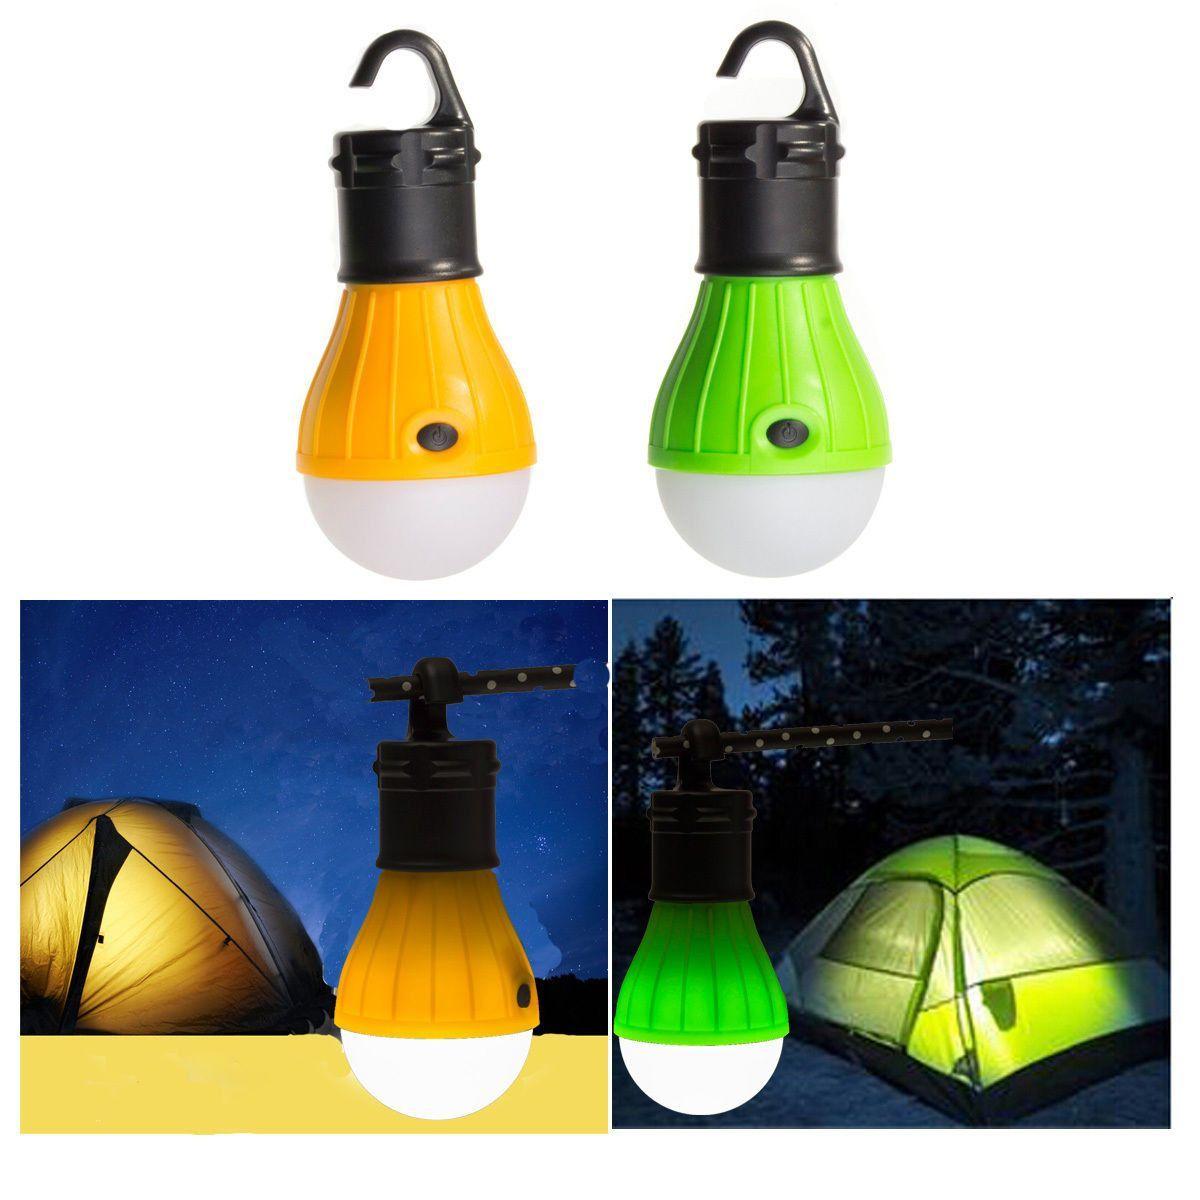 Hanging 3 Led Camping Tent Light Bulb Fishing Lantern Lamp Camping Ideas Camping Vw Camper Y Zelten